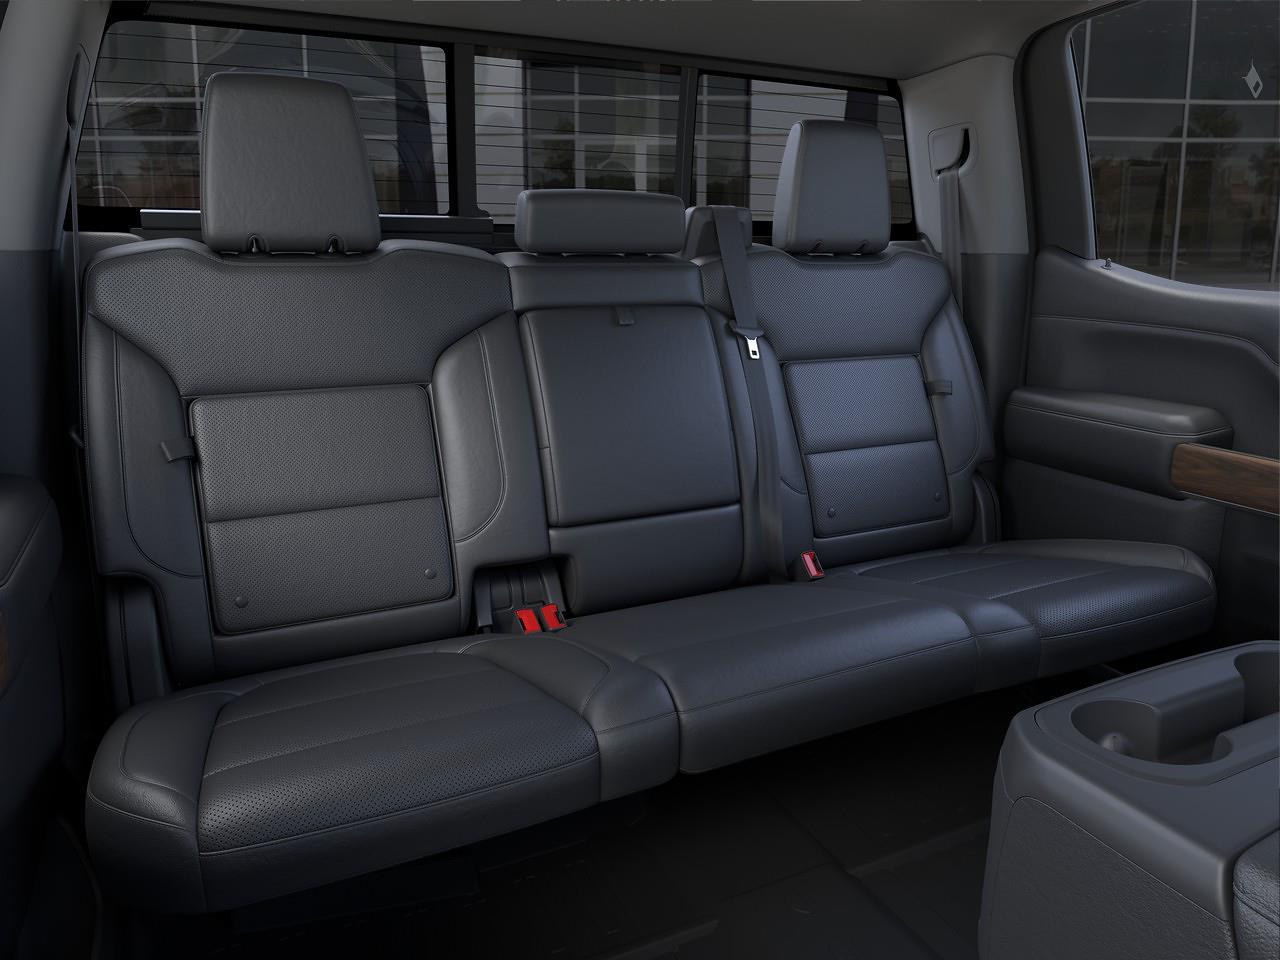 2021 GMC Sierra 1500 Crew Cab 4x4, Pickup #Q10232 - photo 14